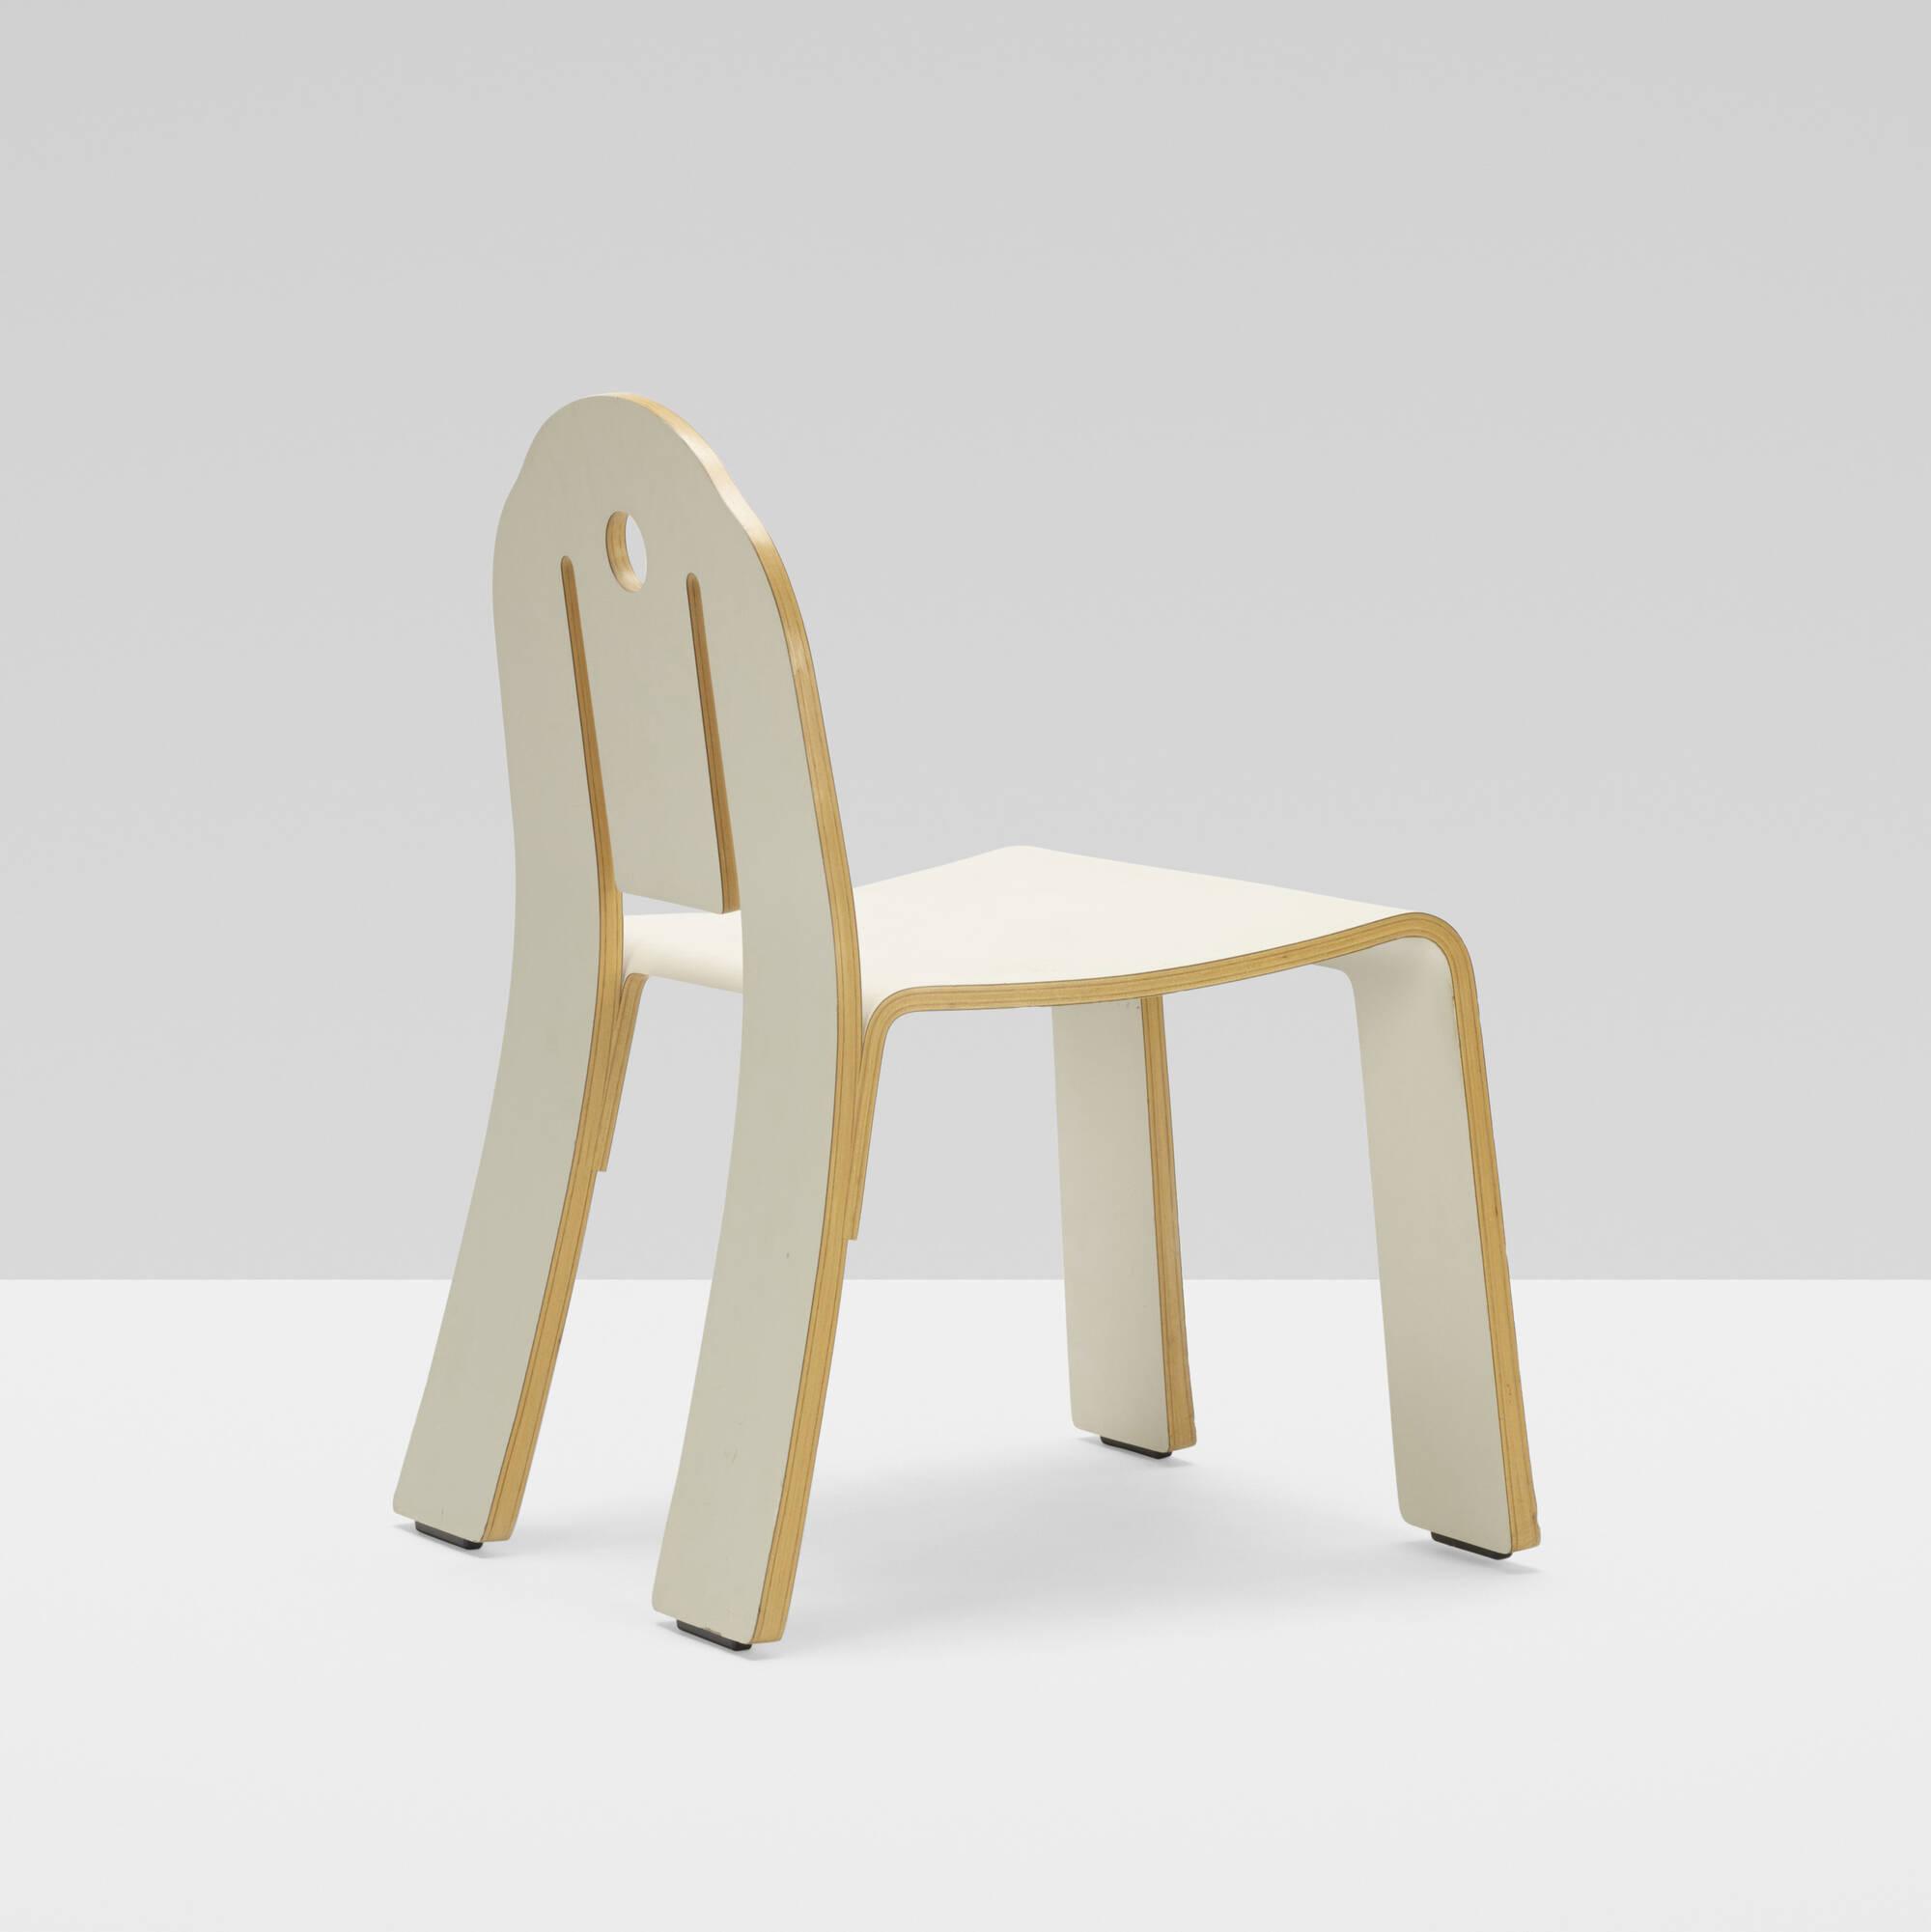 ... 284 Robert Venturi / Art Deco chair (3 of 3) & 284: ROBERT VENTURI Art Deco chair u003c Design 9 June 2016 u003c Auctions ...